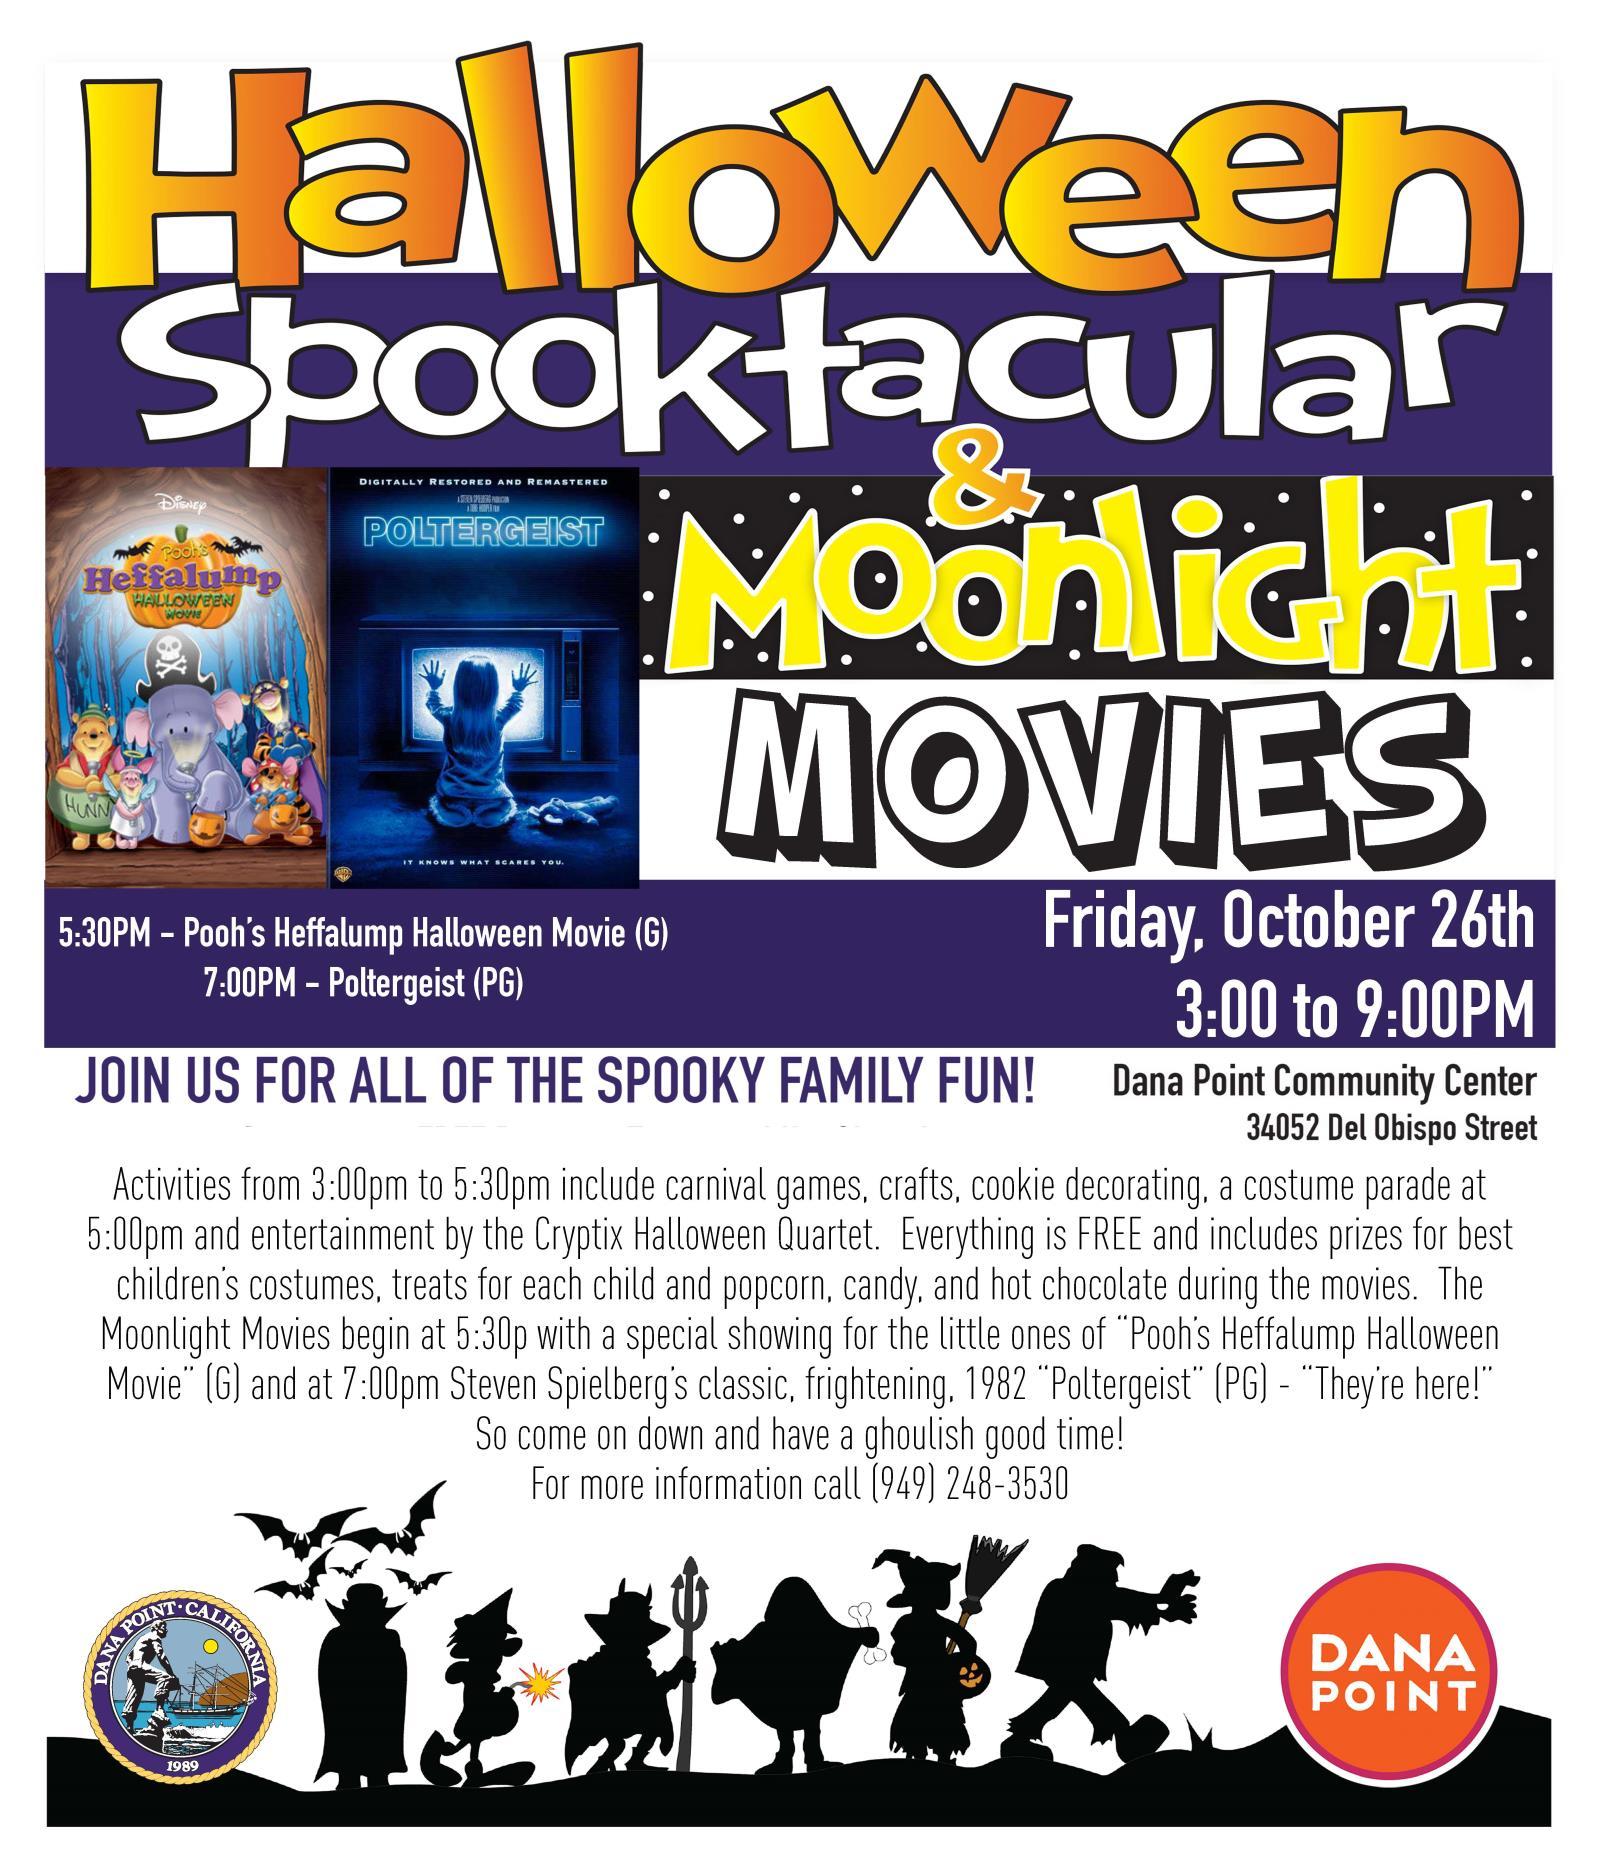 Halloween Spooktacular Movie.Halloween Spooktacular Moonlight Movies Calendar City